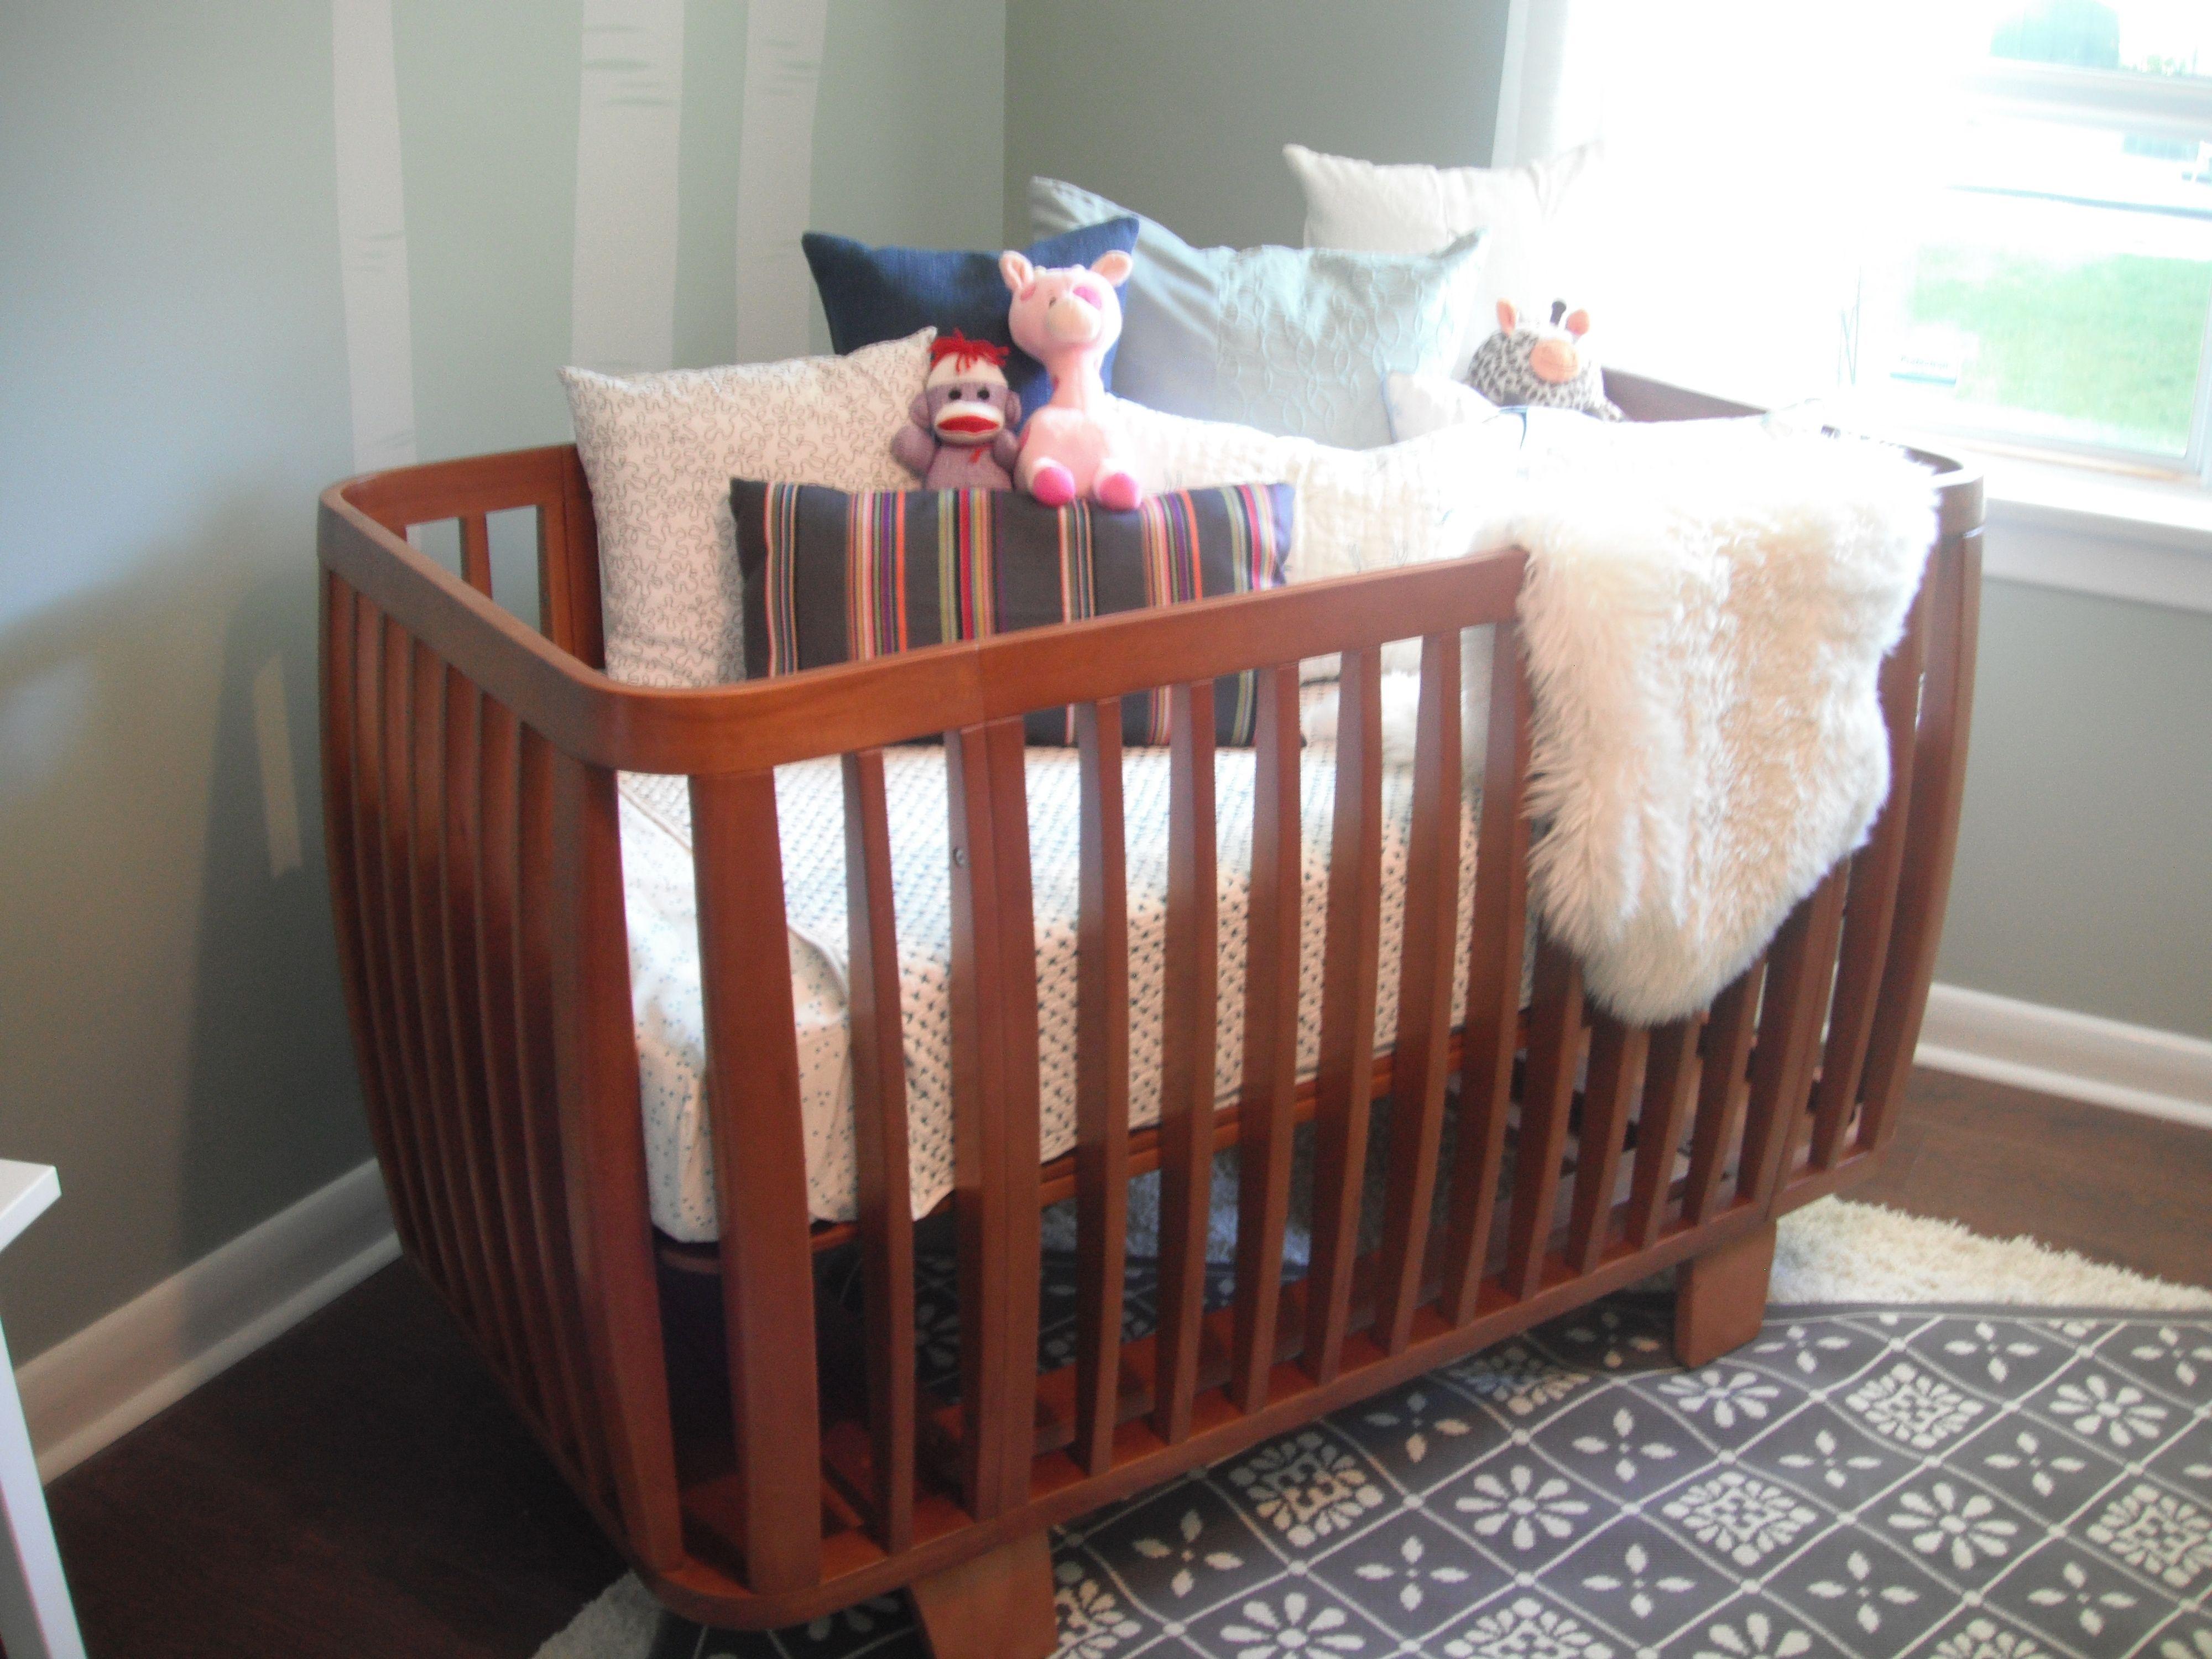 bloom cribs - ella elliot bloom retro crib in oak jennifer derek